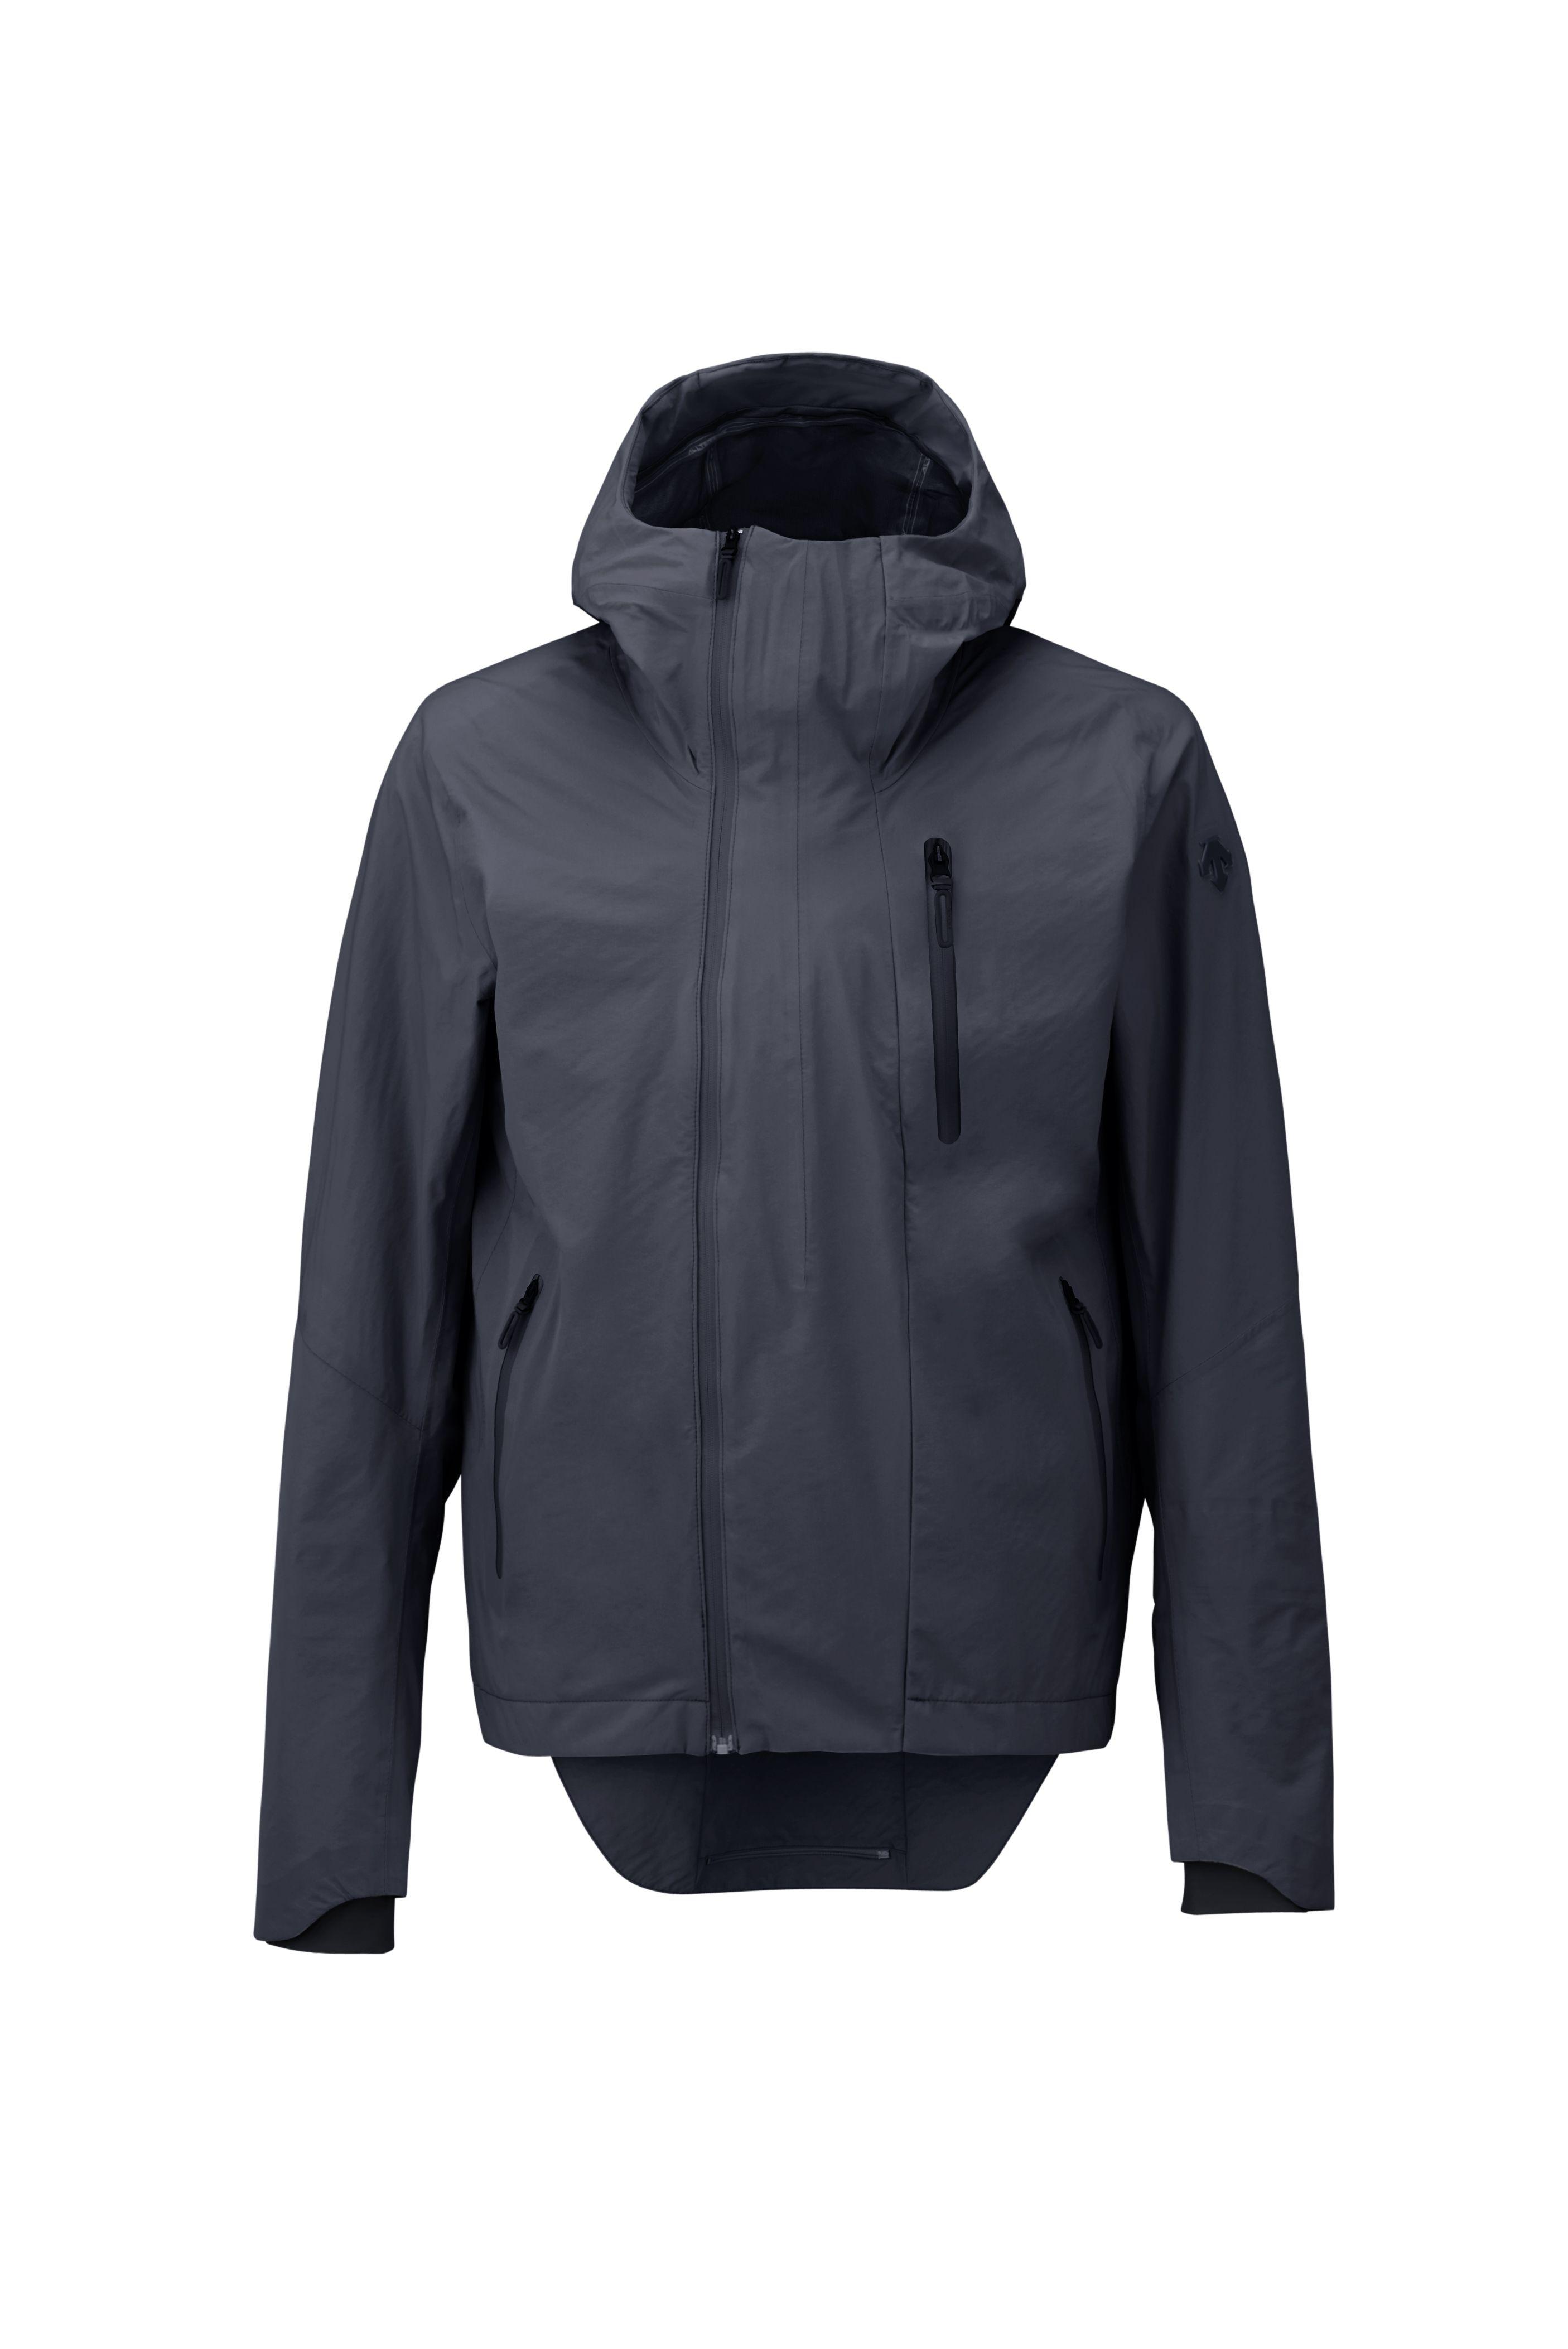 Shell Dia3605u Boa Jacket Shell Hooded Hooded Boa Dia3605u Jacket ICttqYfw